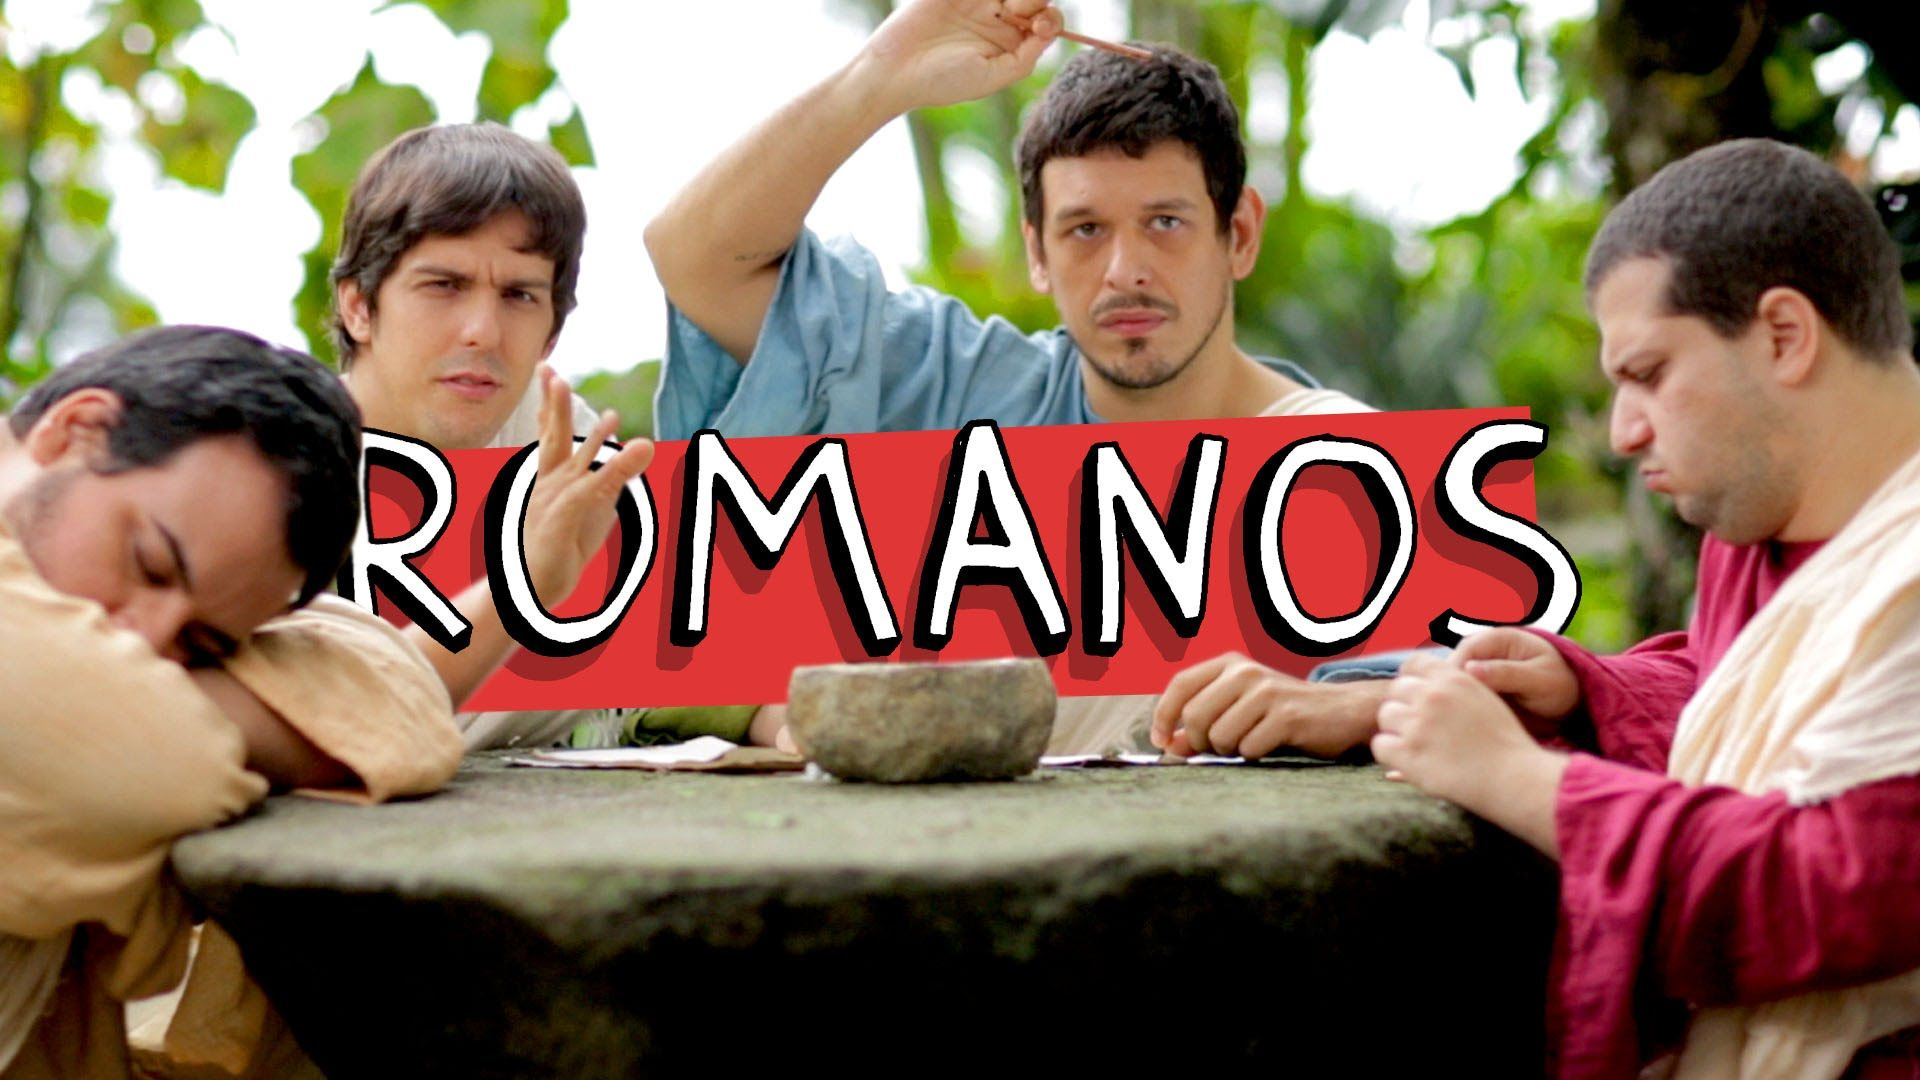 Romanos - Porta dos Fundos